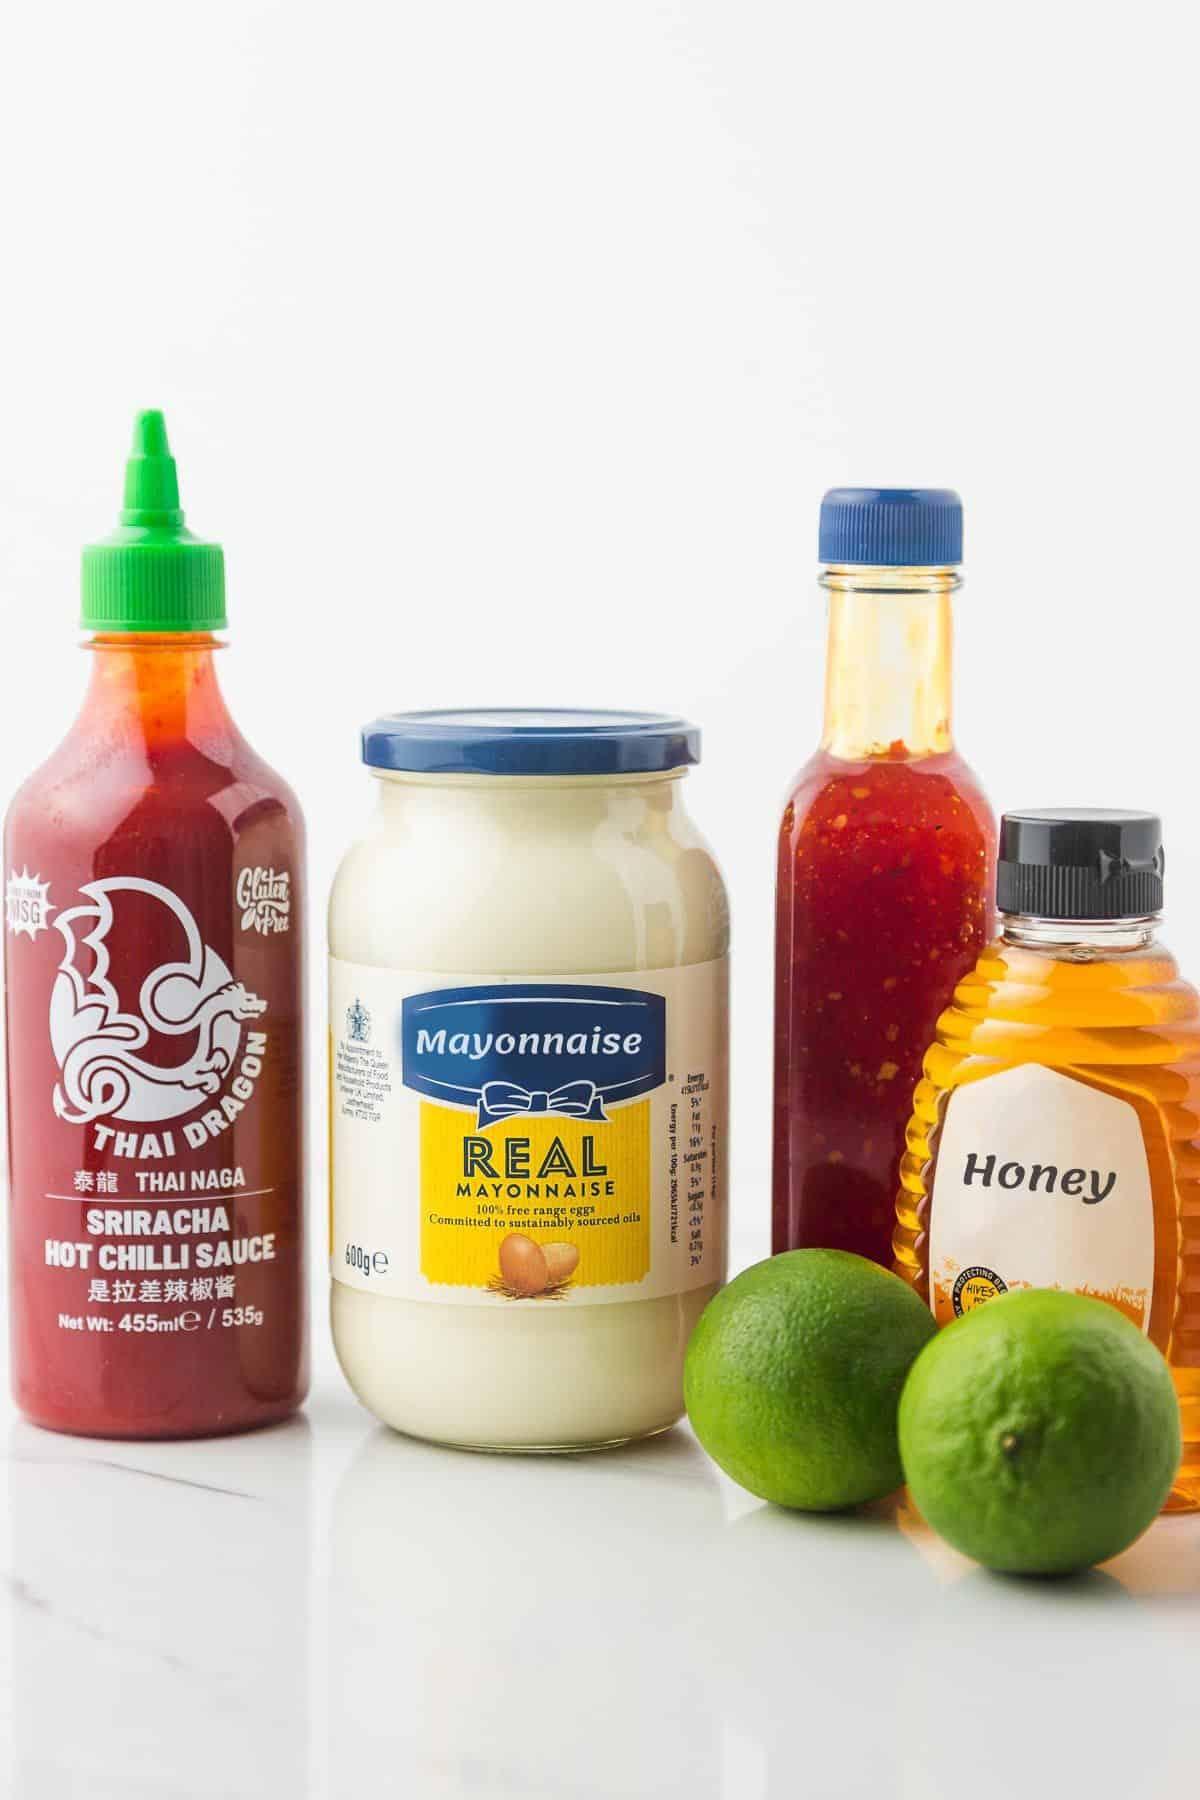 Bang bang sauce ingredients. Sriracha, mayo, sweet chili sauce, honey, and 2 limes.